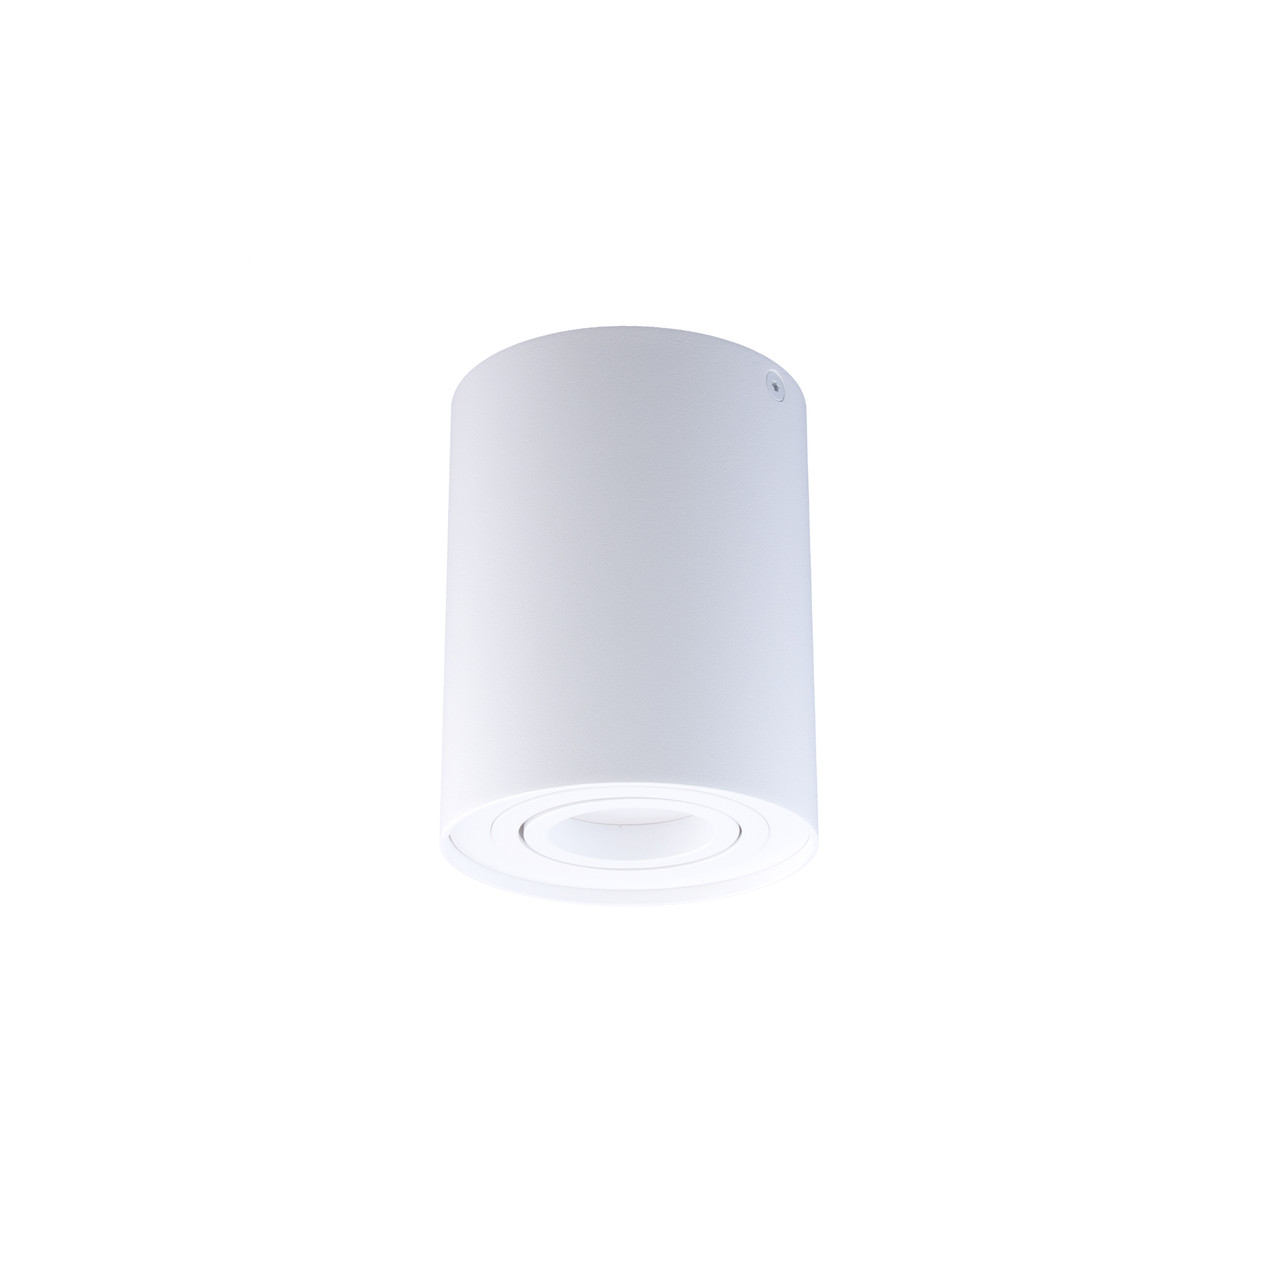 Точечный светильник Skarlat TH5801 WH